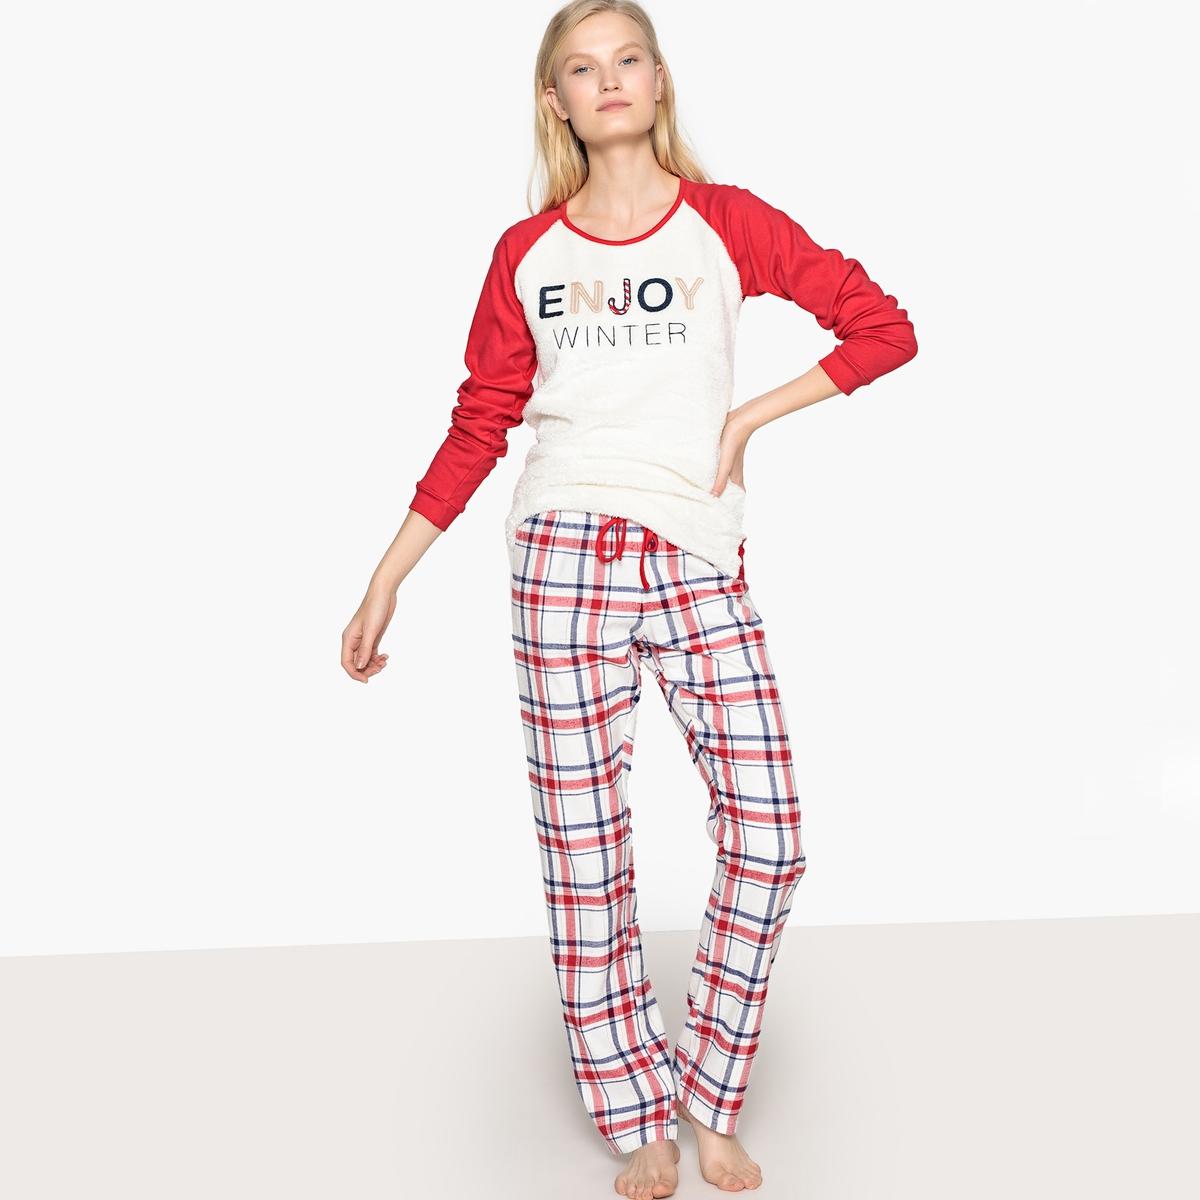 Pijama con mensaje